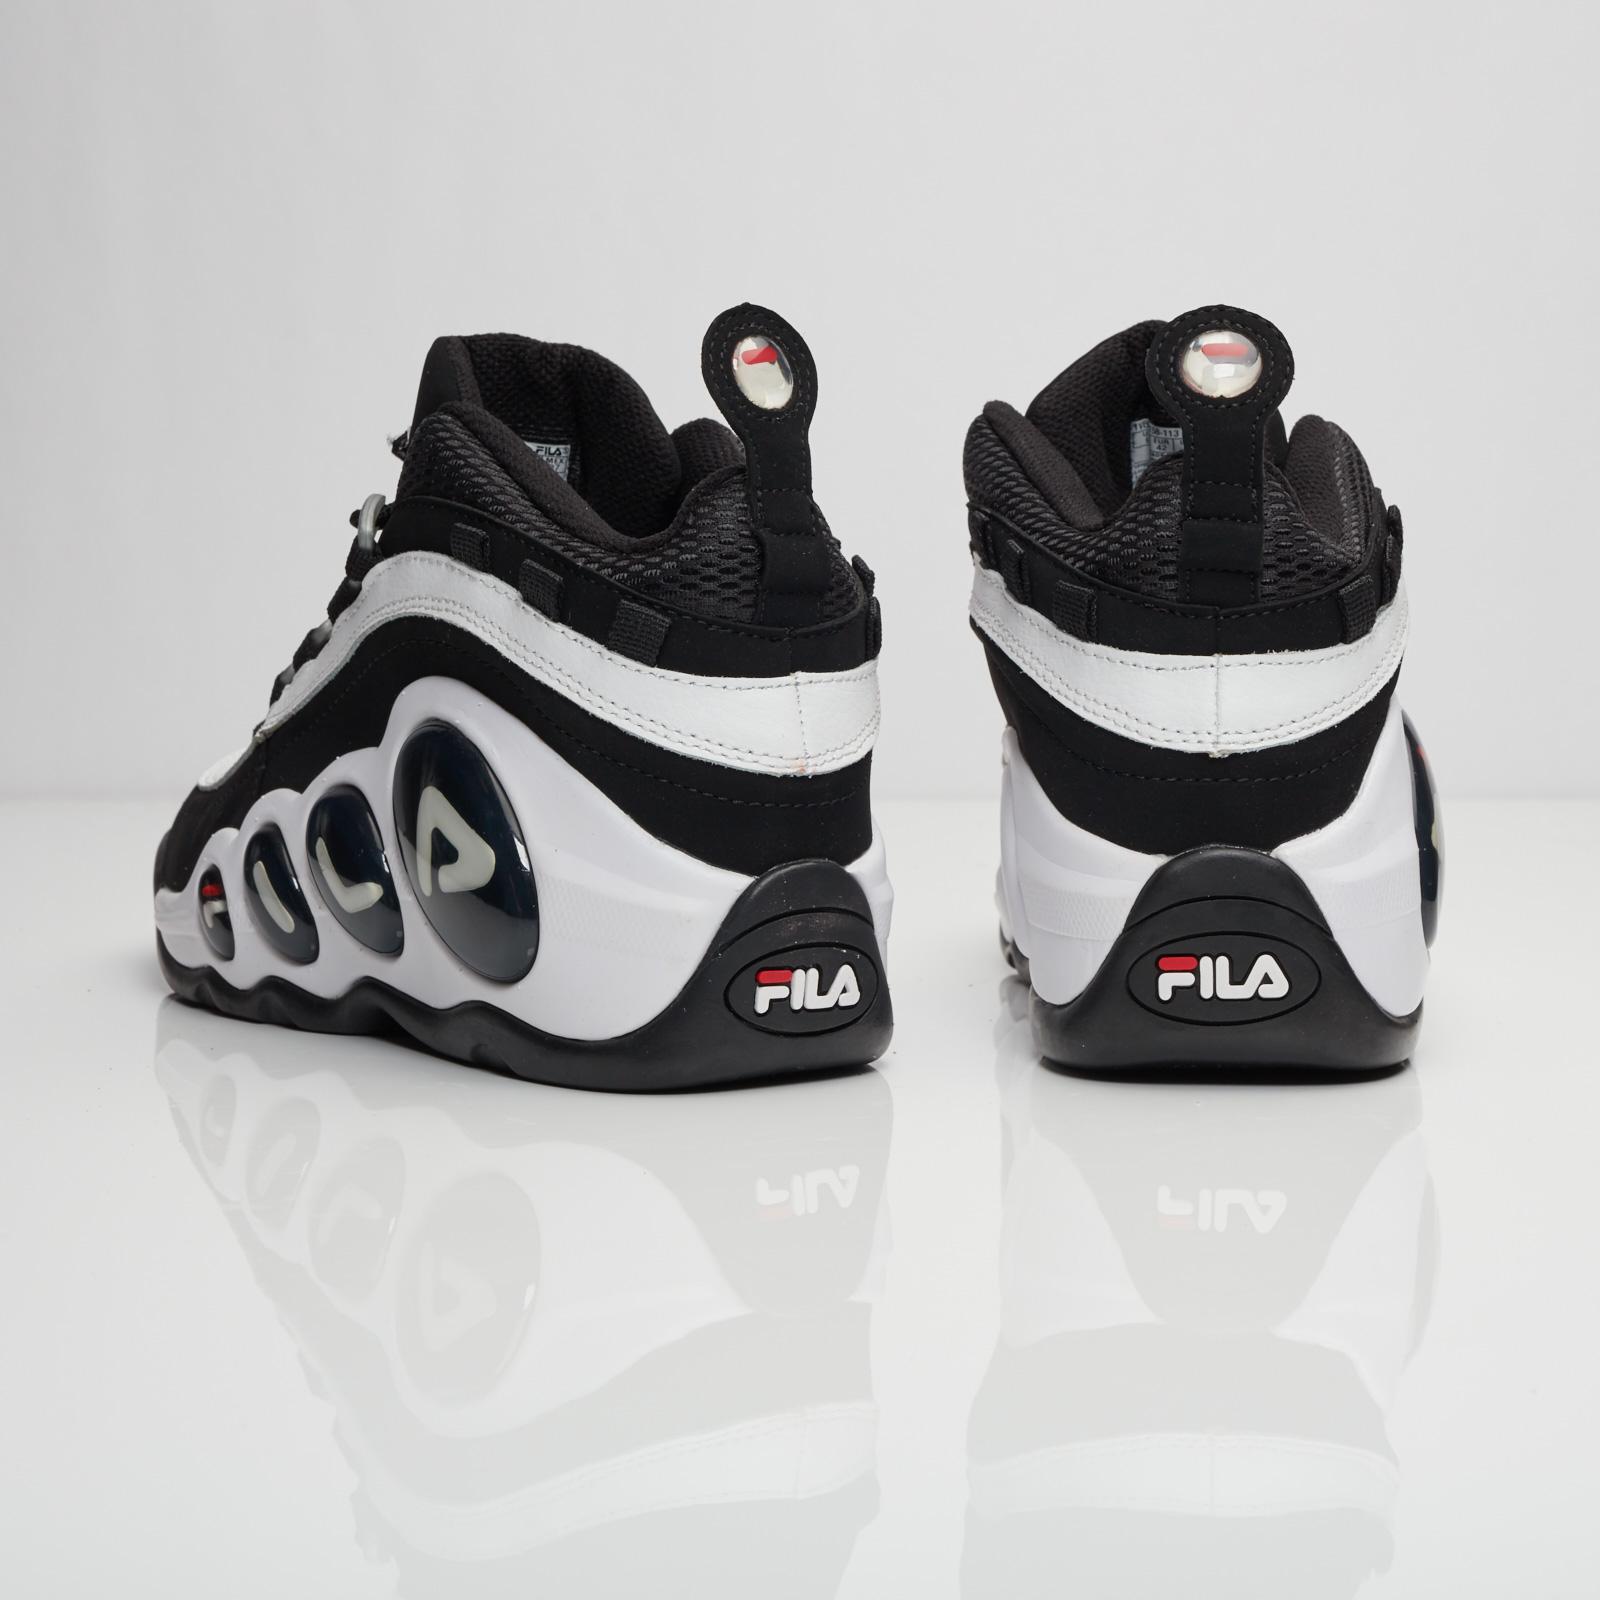 fila bubble shoes